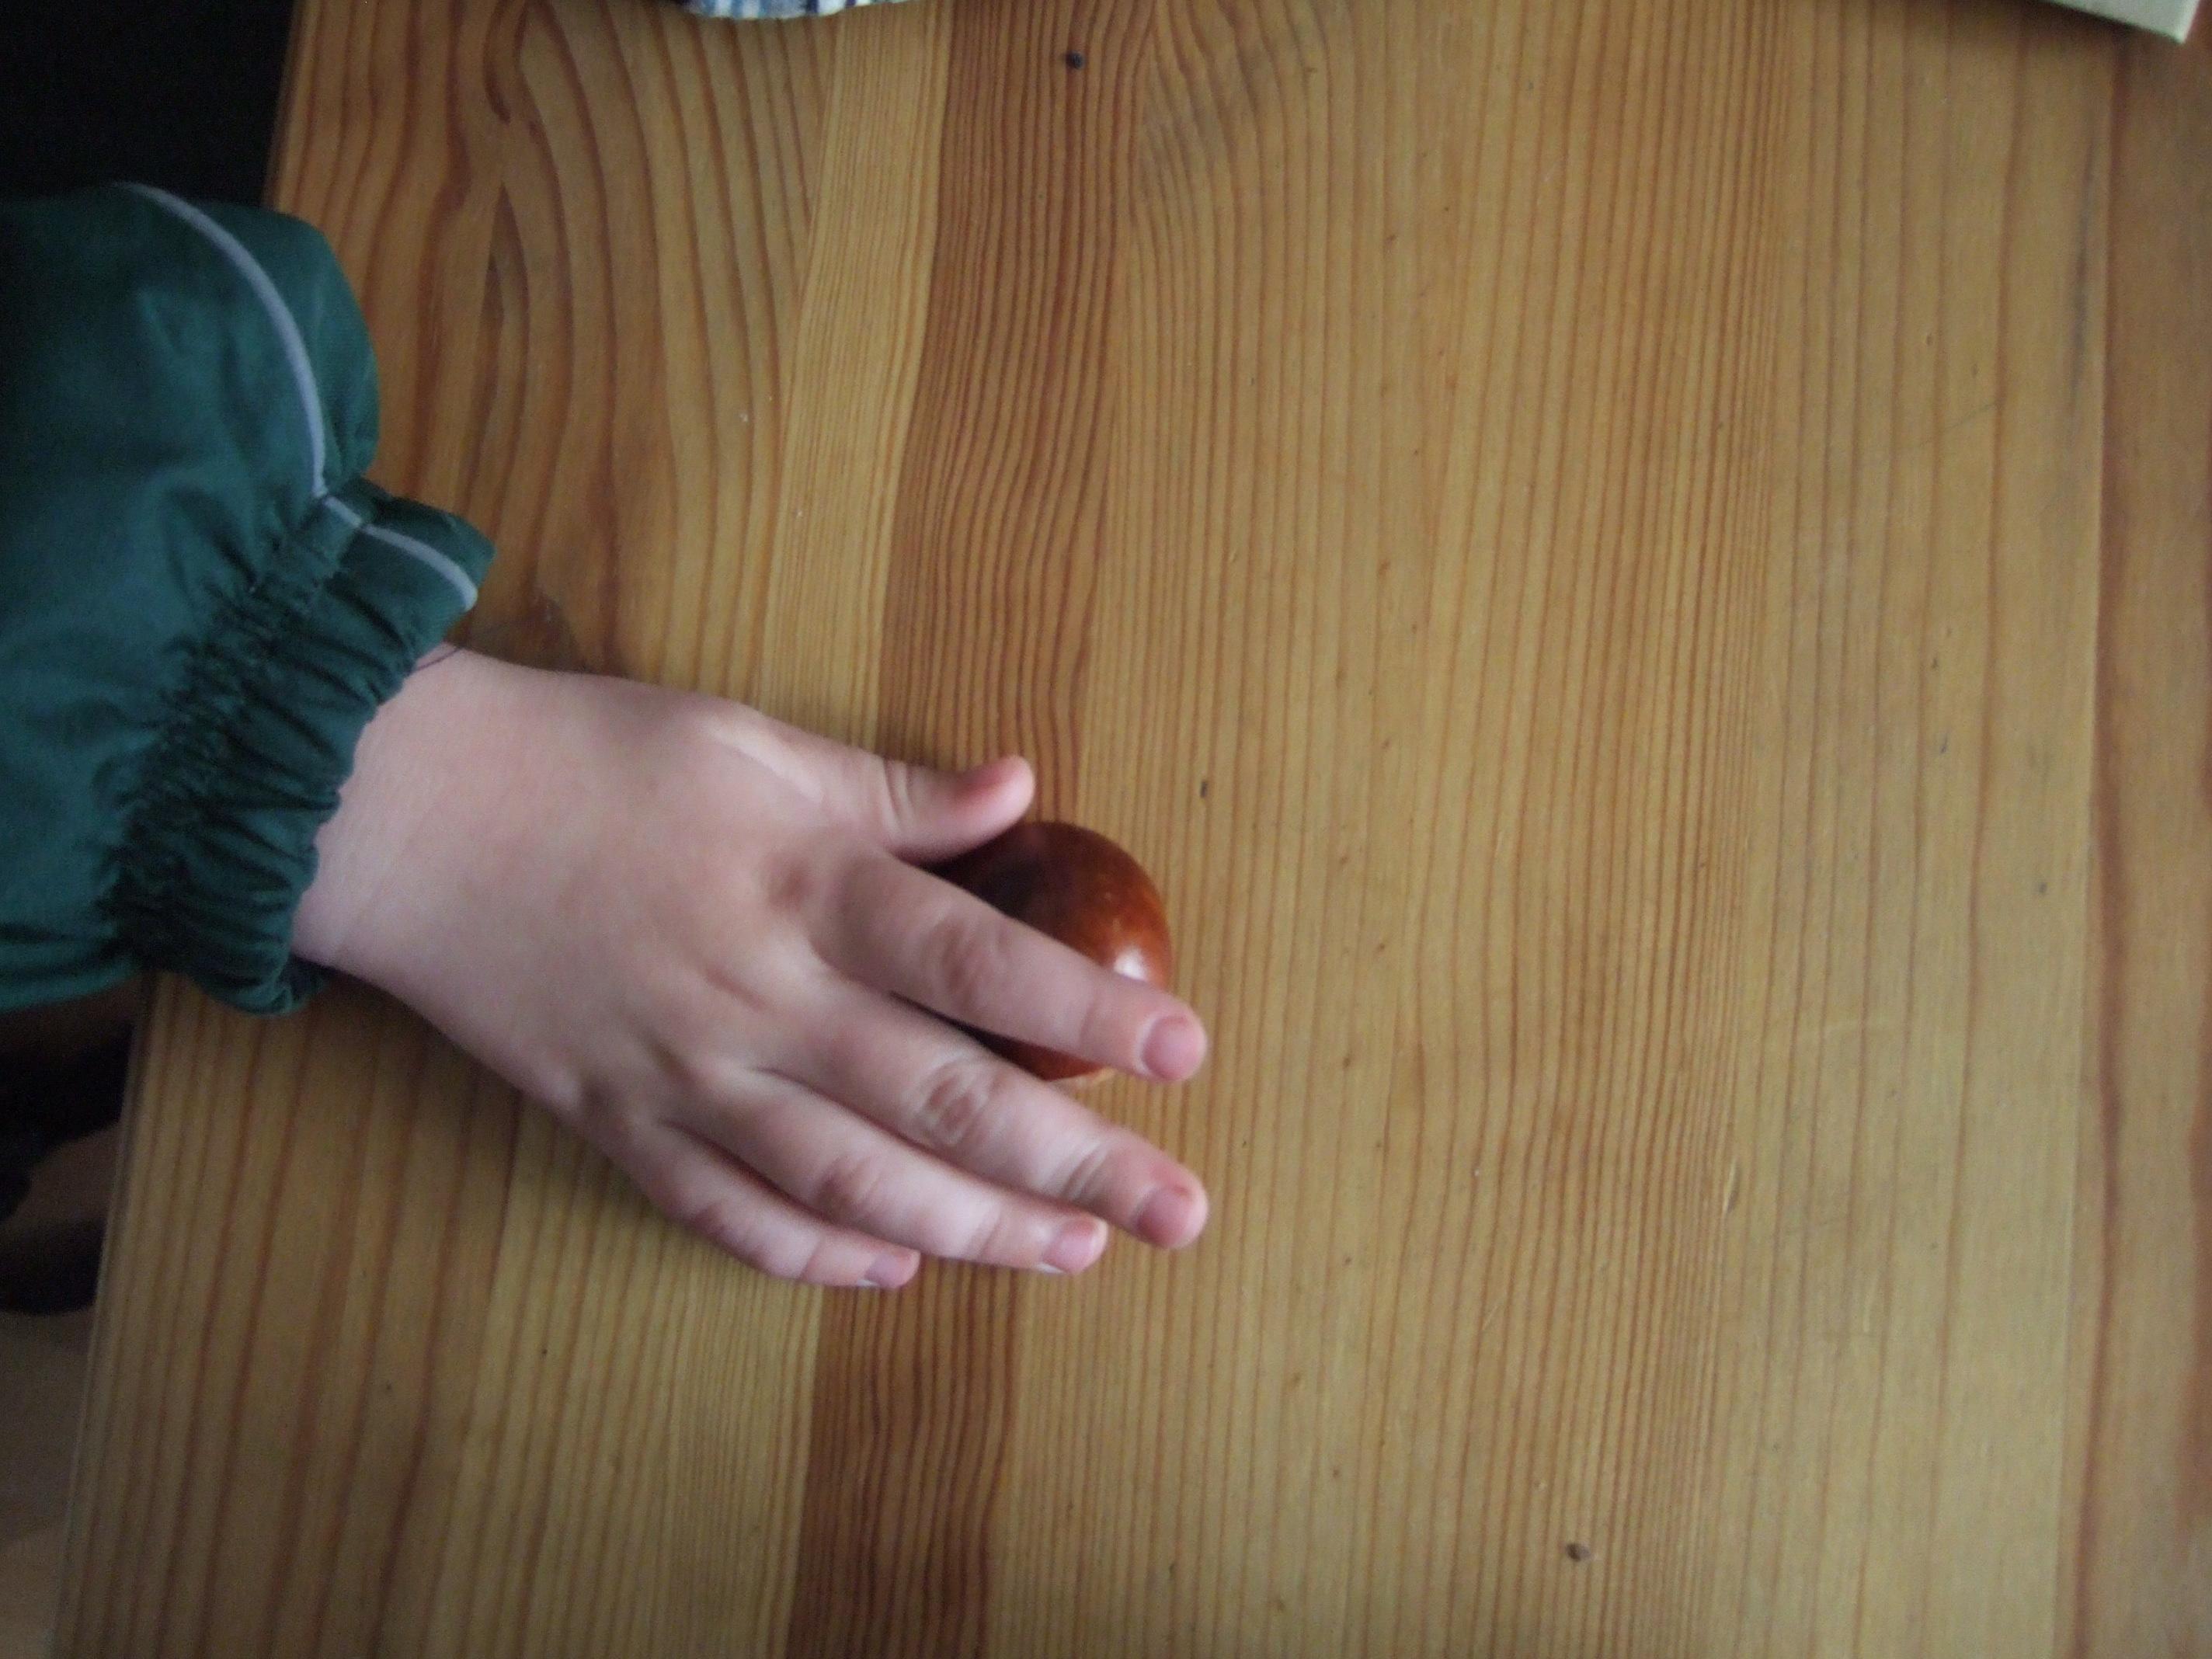 tabus nature characters humanoids hand opening door kid child